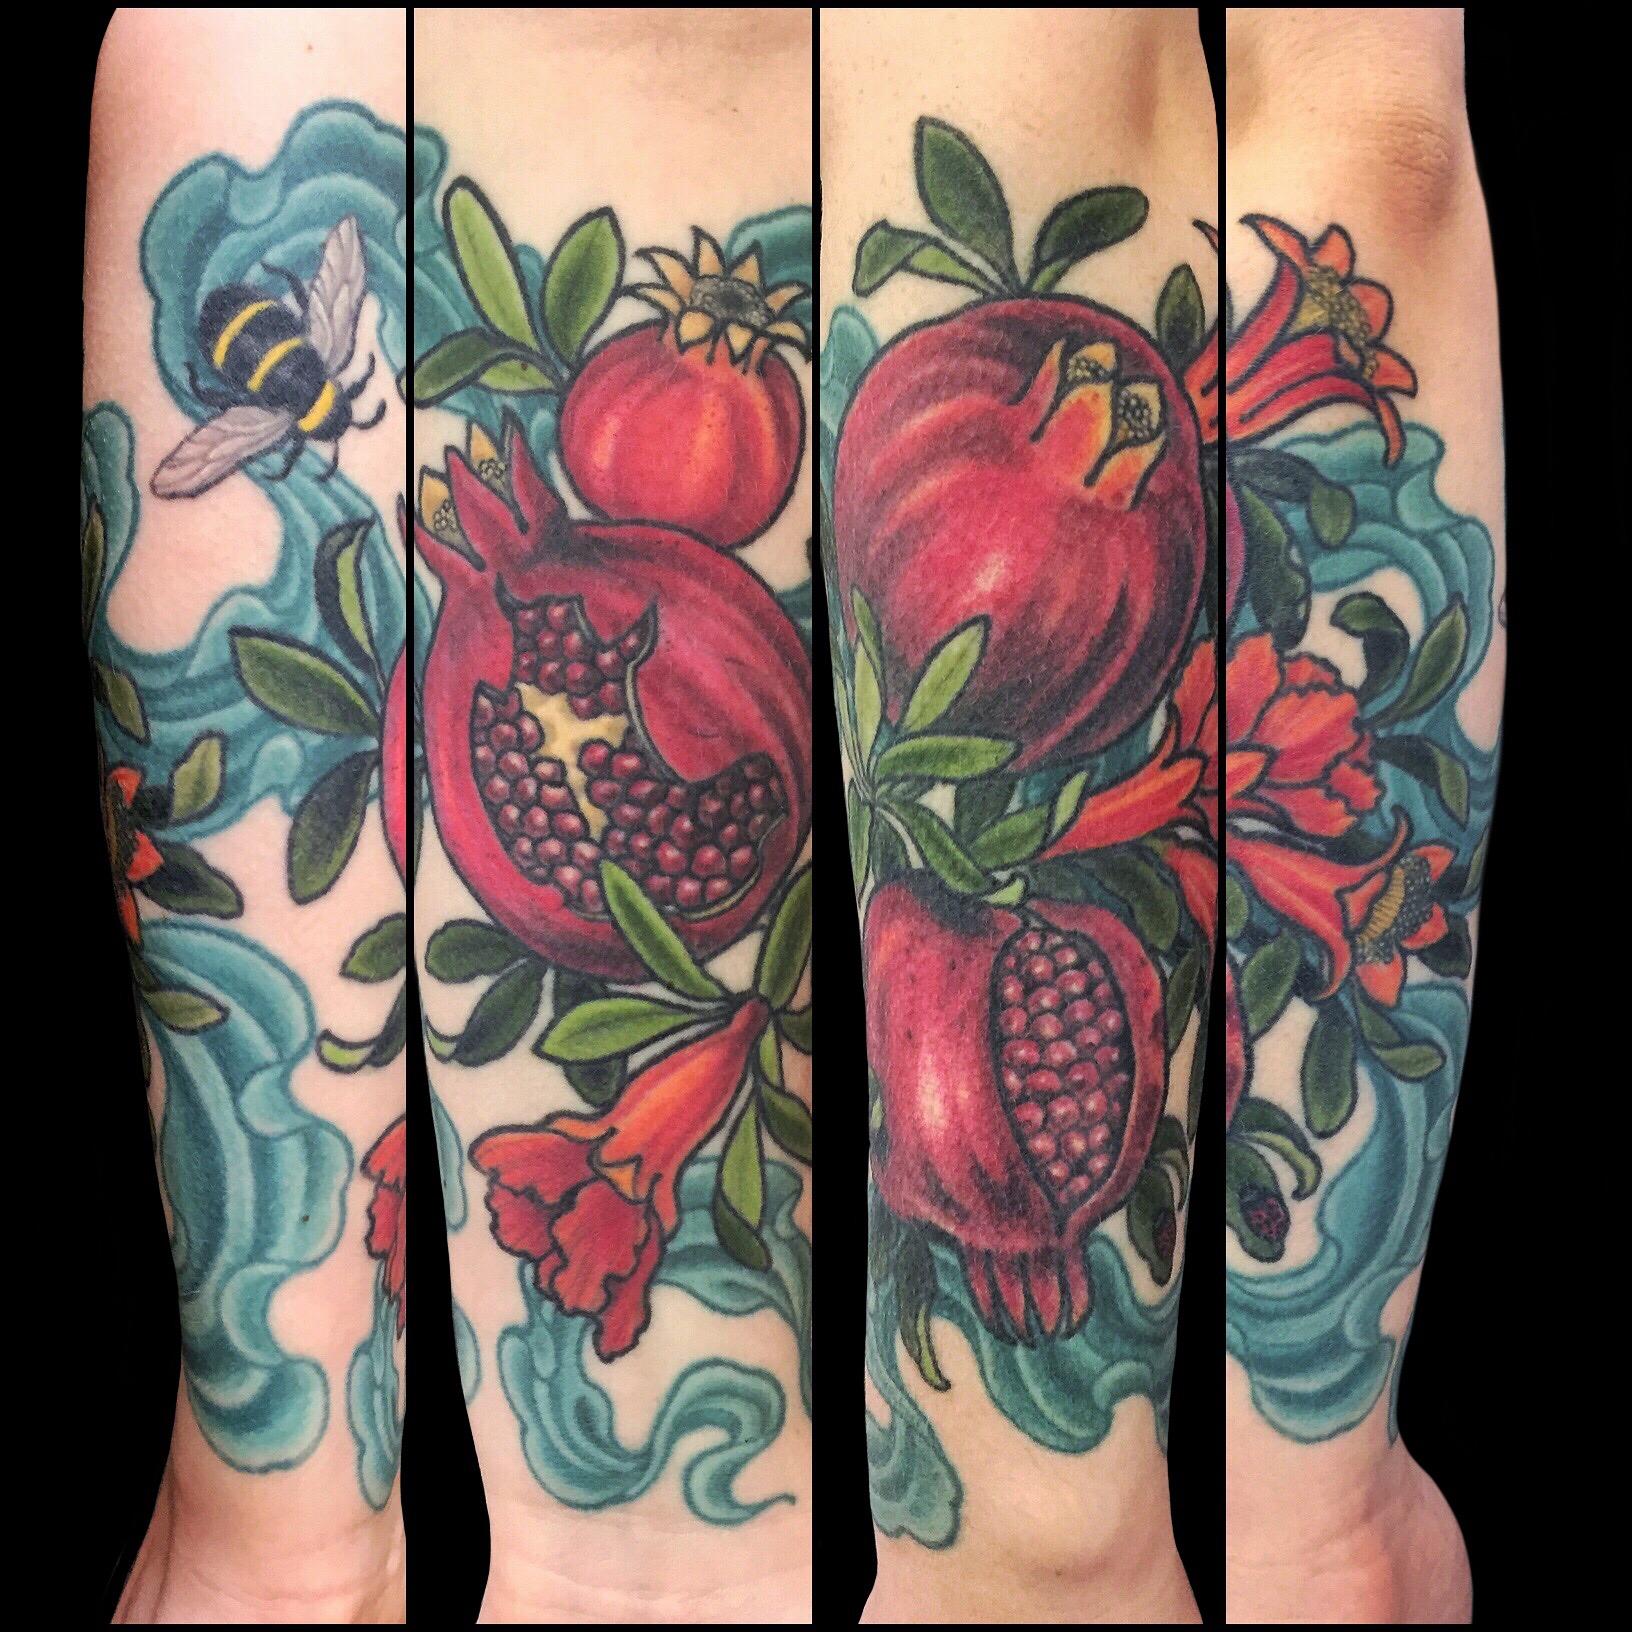 sequoia's pomegranates